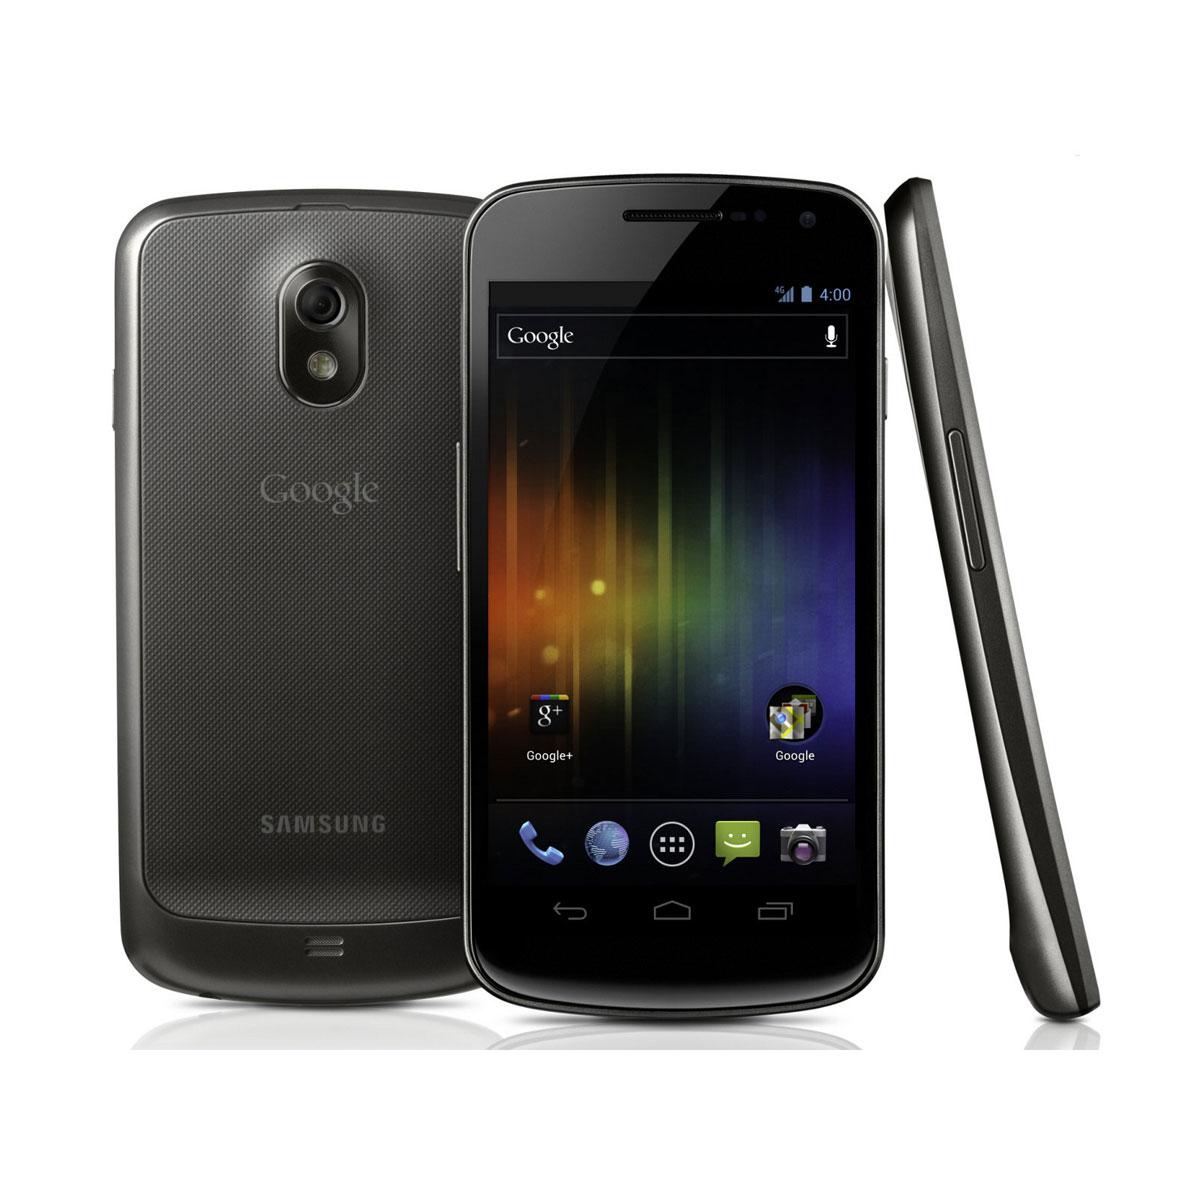 "Mobile & smartphone Samsung Galaxy Nexus GT-i9250 Smartphone 3G+ avec écran tactile HD 4.65"" Super AMOLED HD sous Android 4.0"